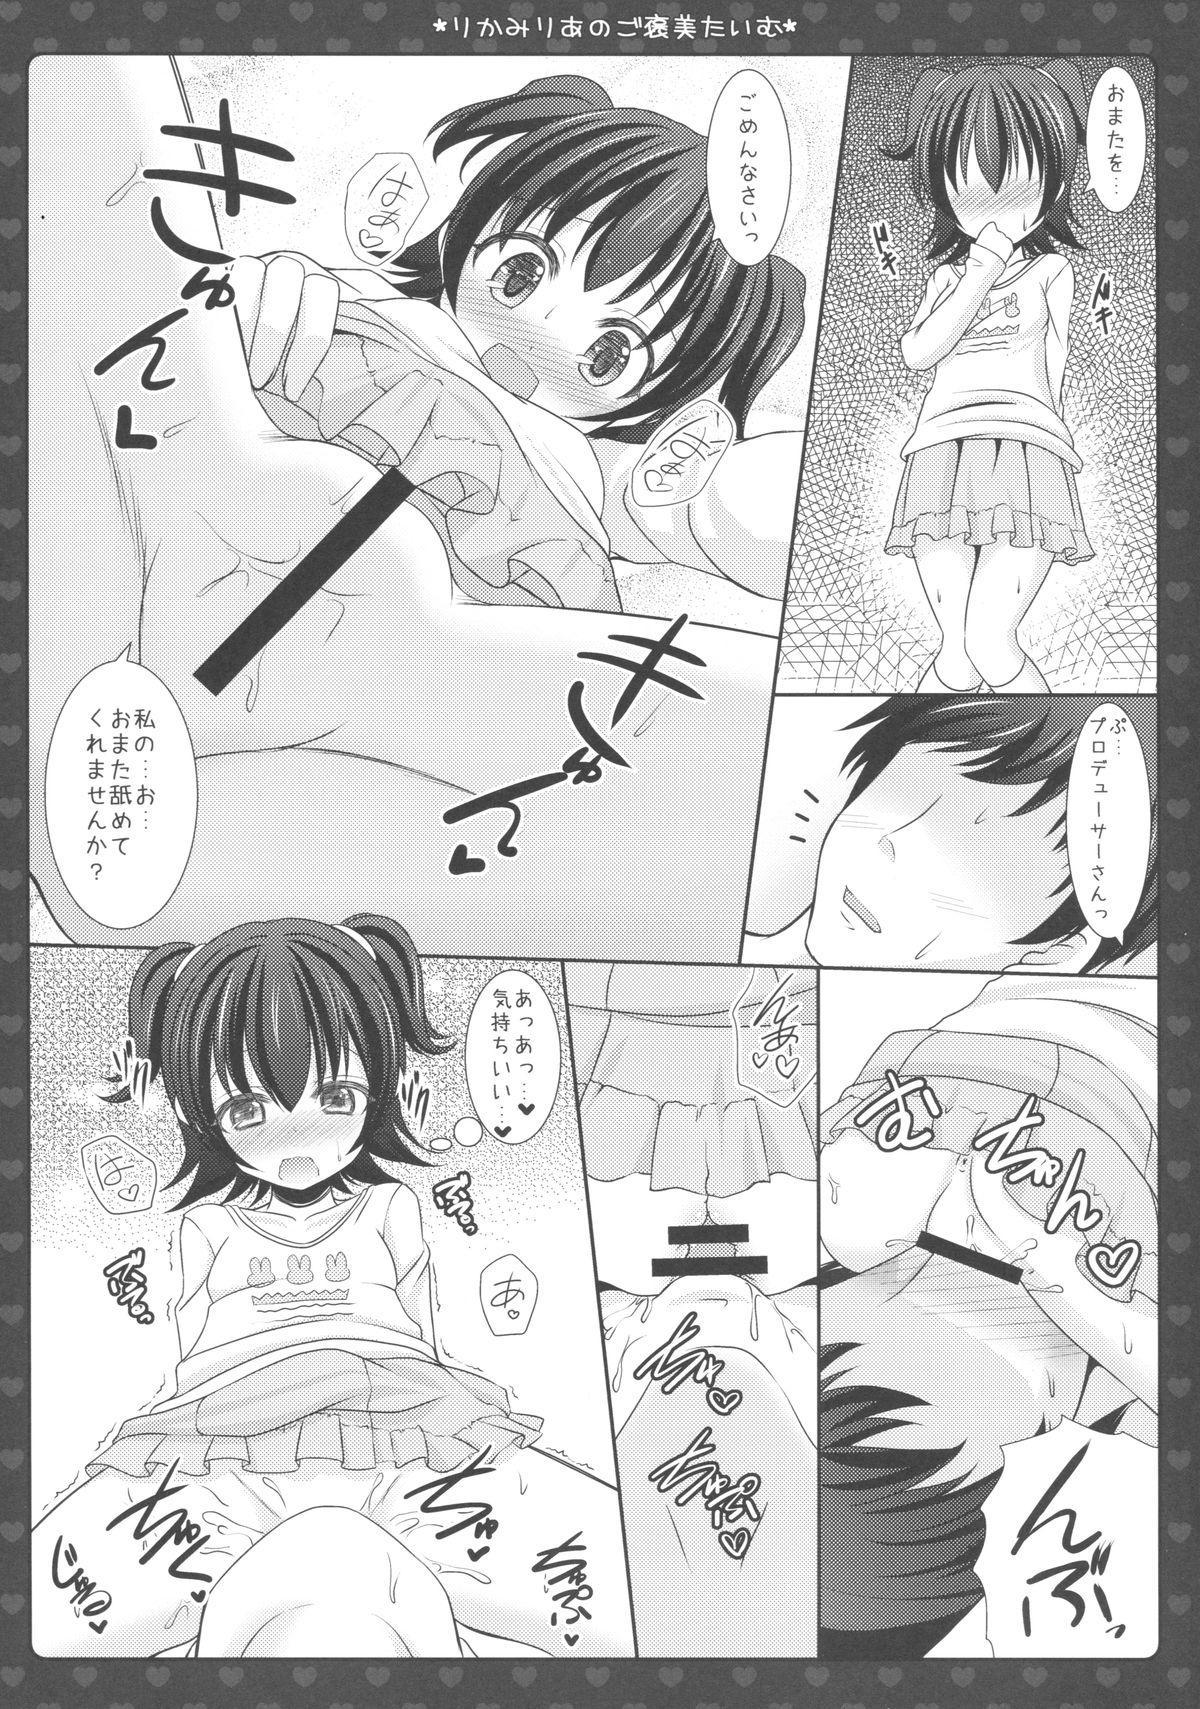 Rika Miria no Gohoubi Time 6